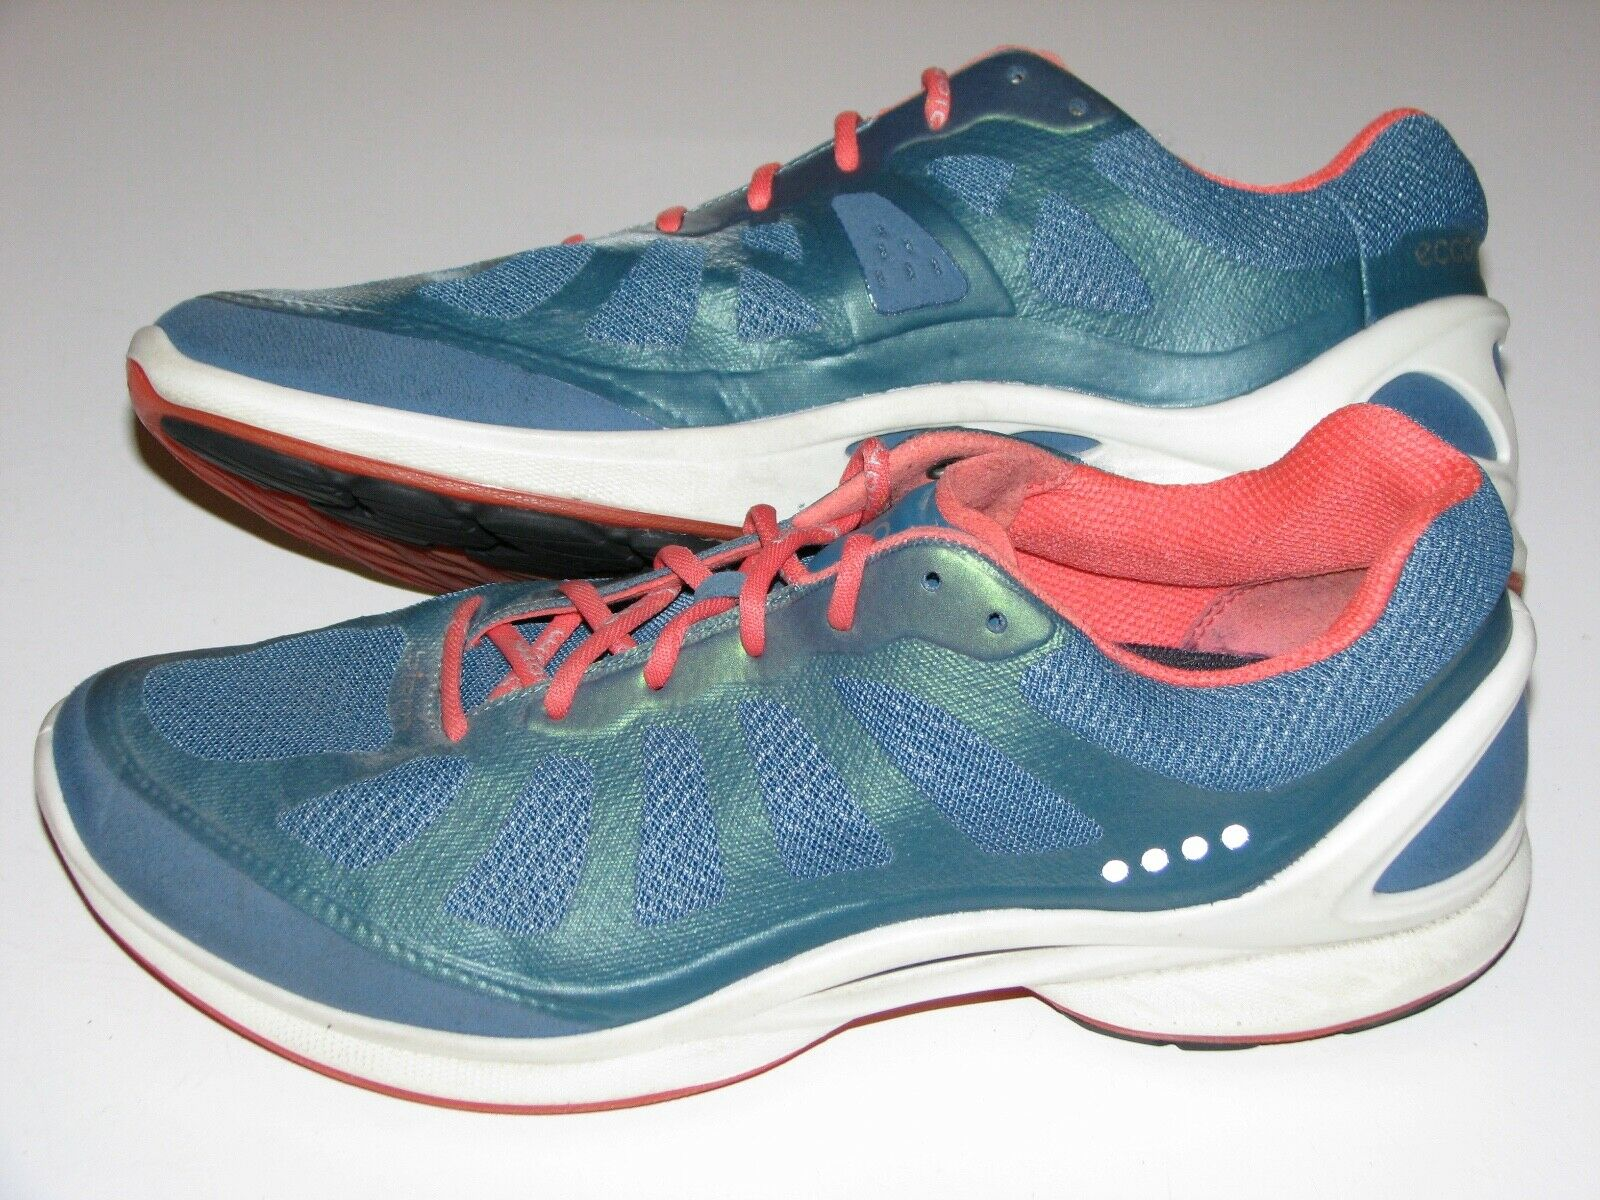 Ecco Biom Performance Running shoes sz 7M, 38 Euro